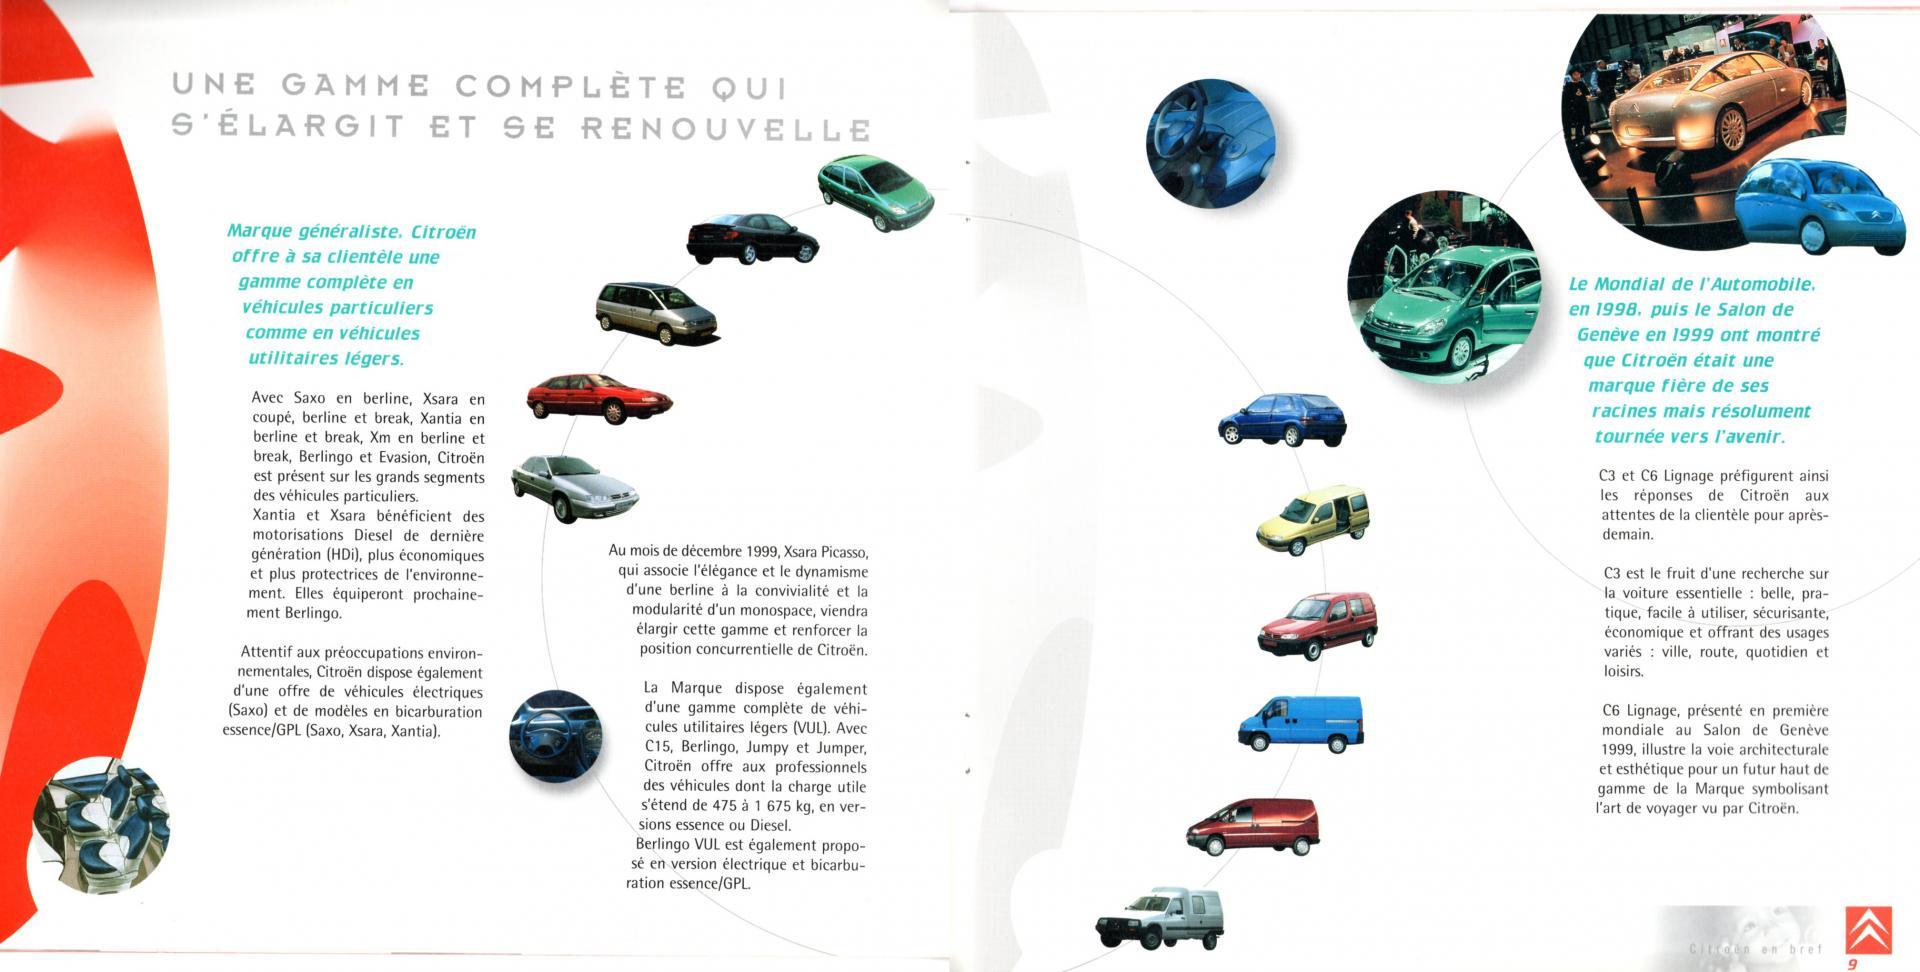 Image gamme Citroën 1999